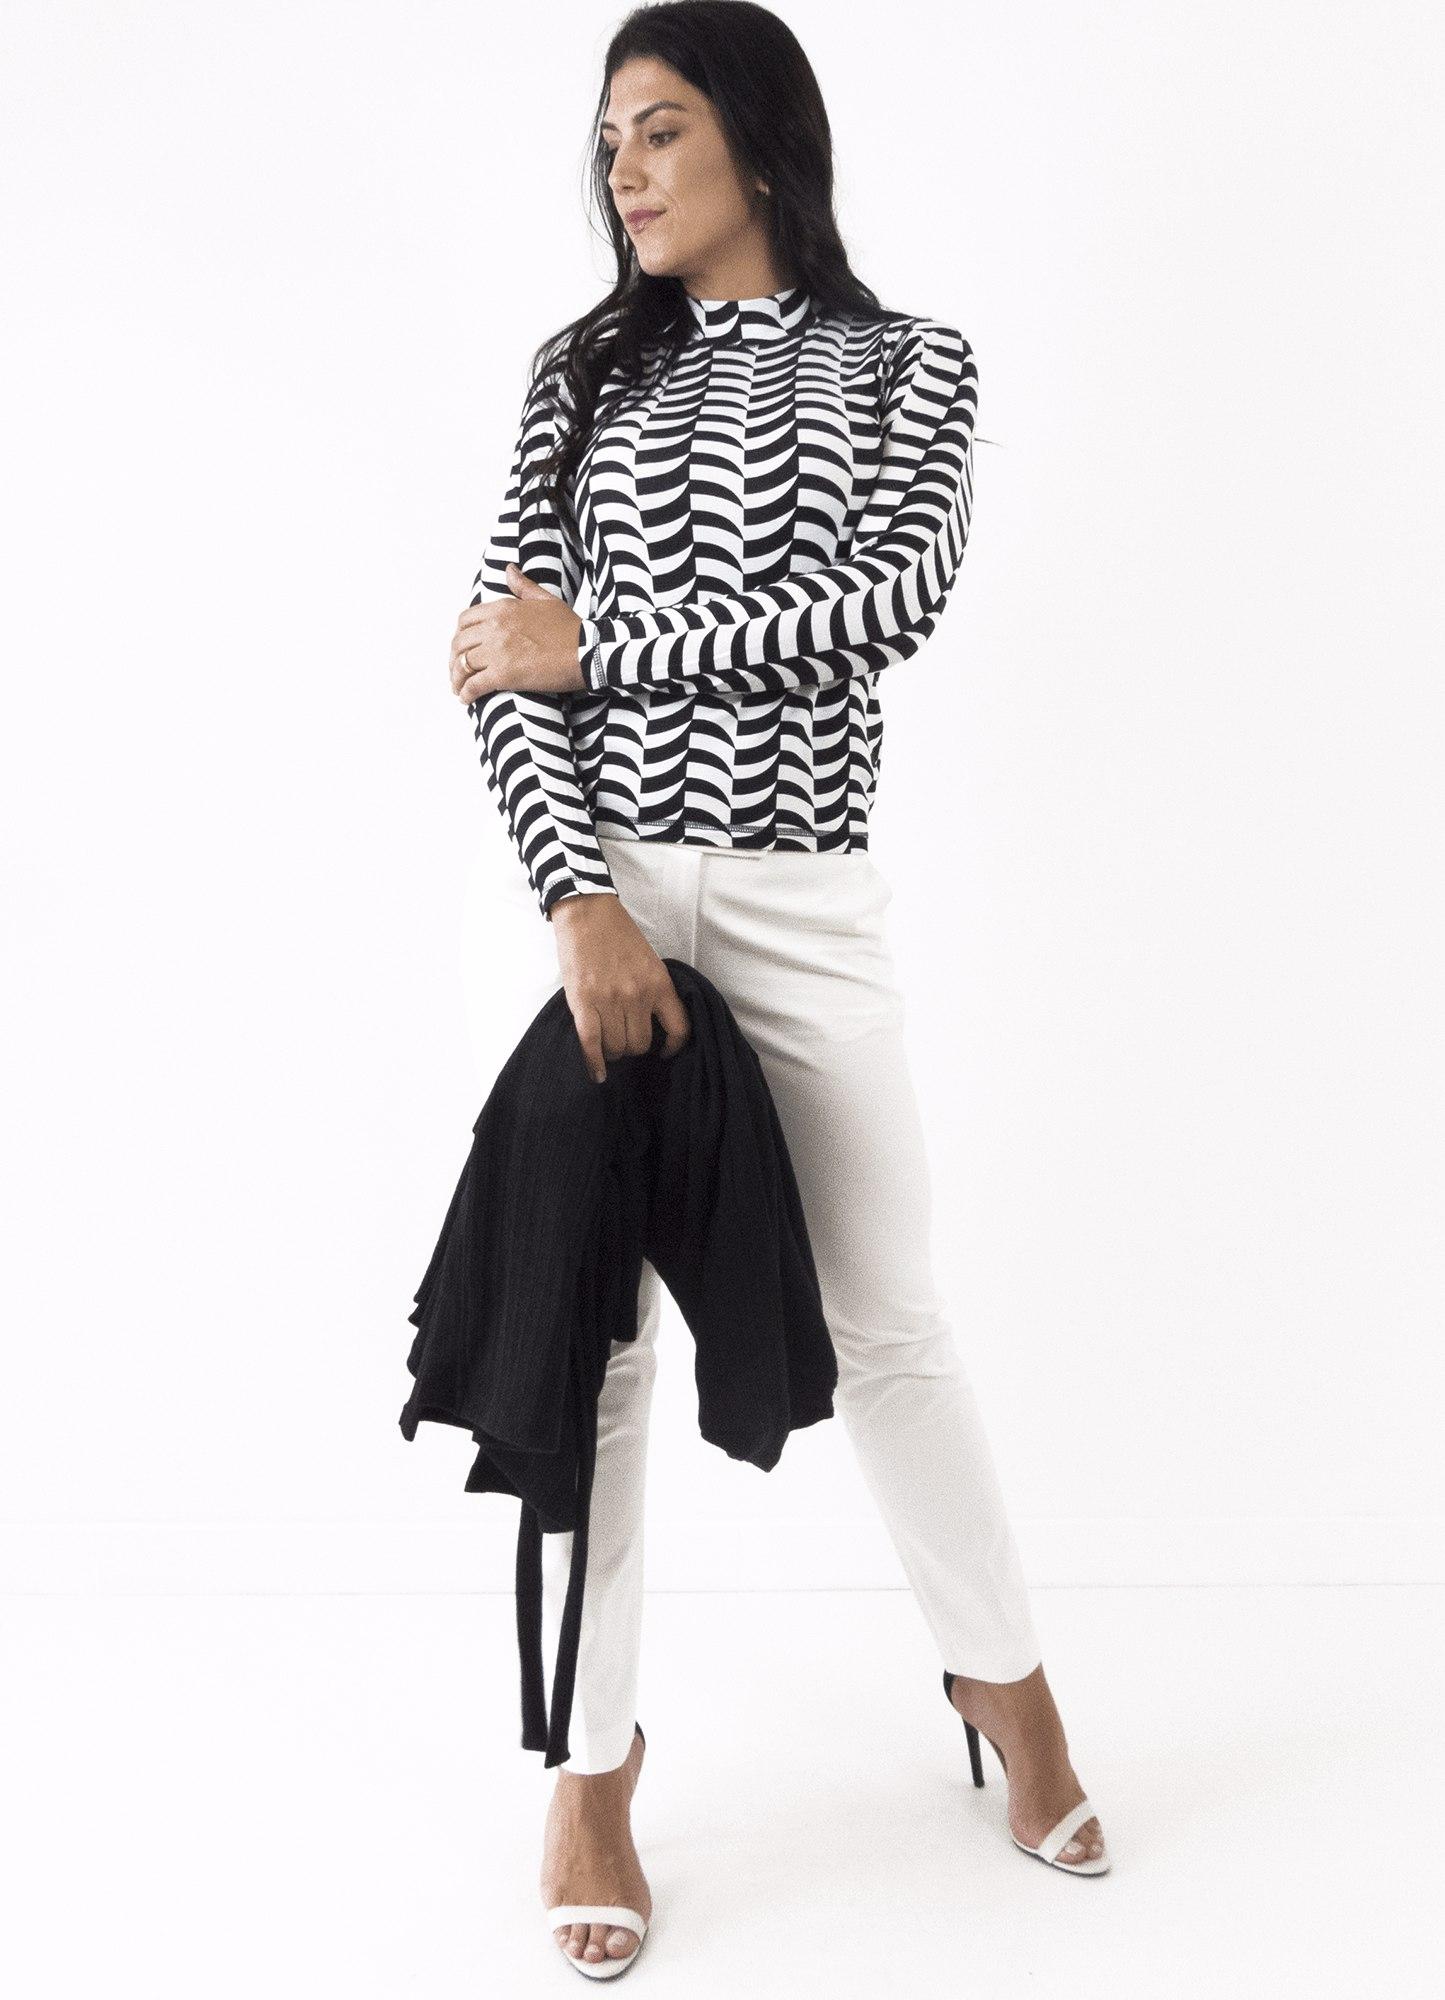 Blusa Feminina Viscose Estampada Preta e Branca Cacharrel